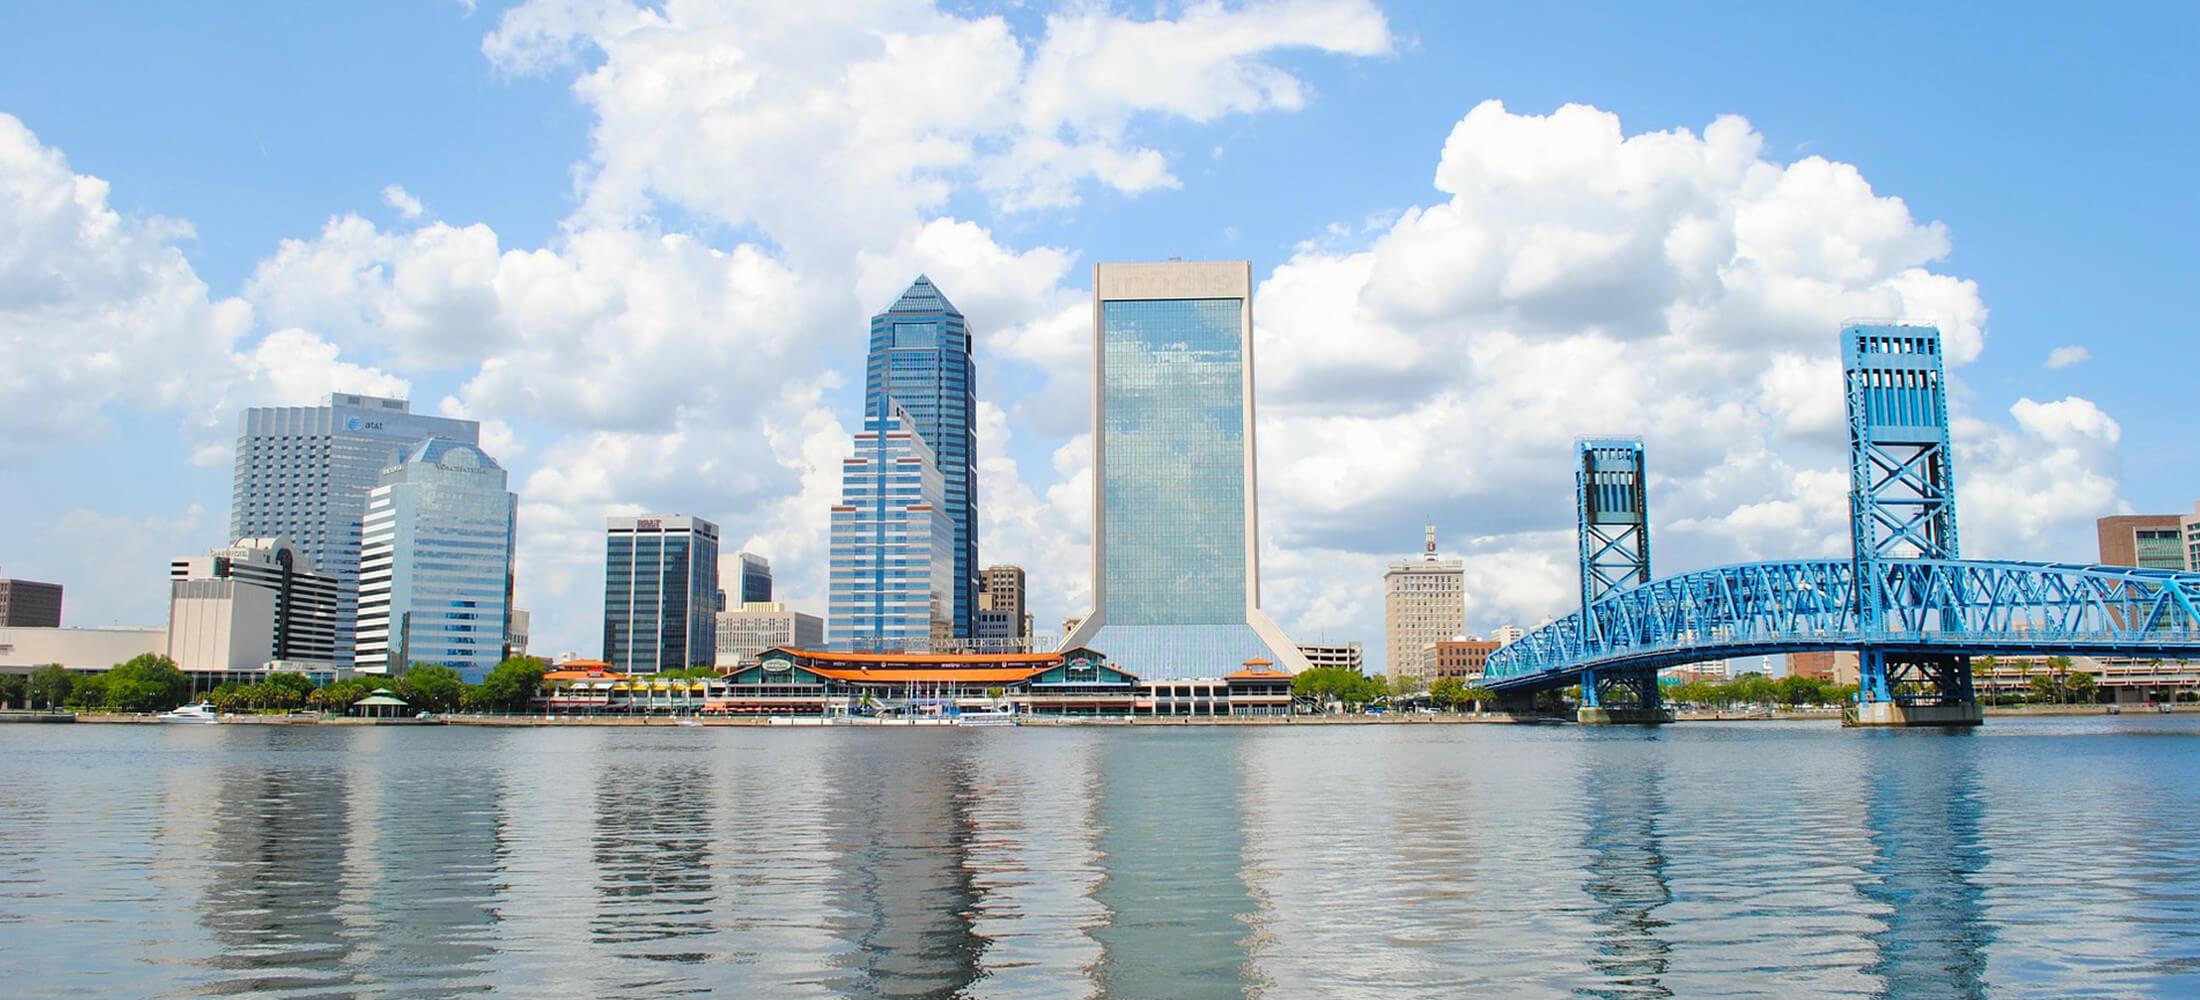 Heron Walk Apartments - Apartments in Jacksonville, FL